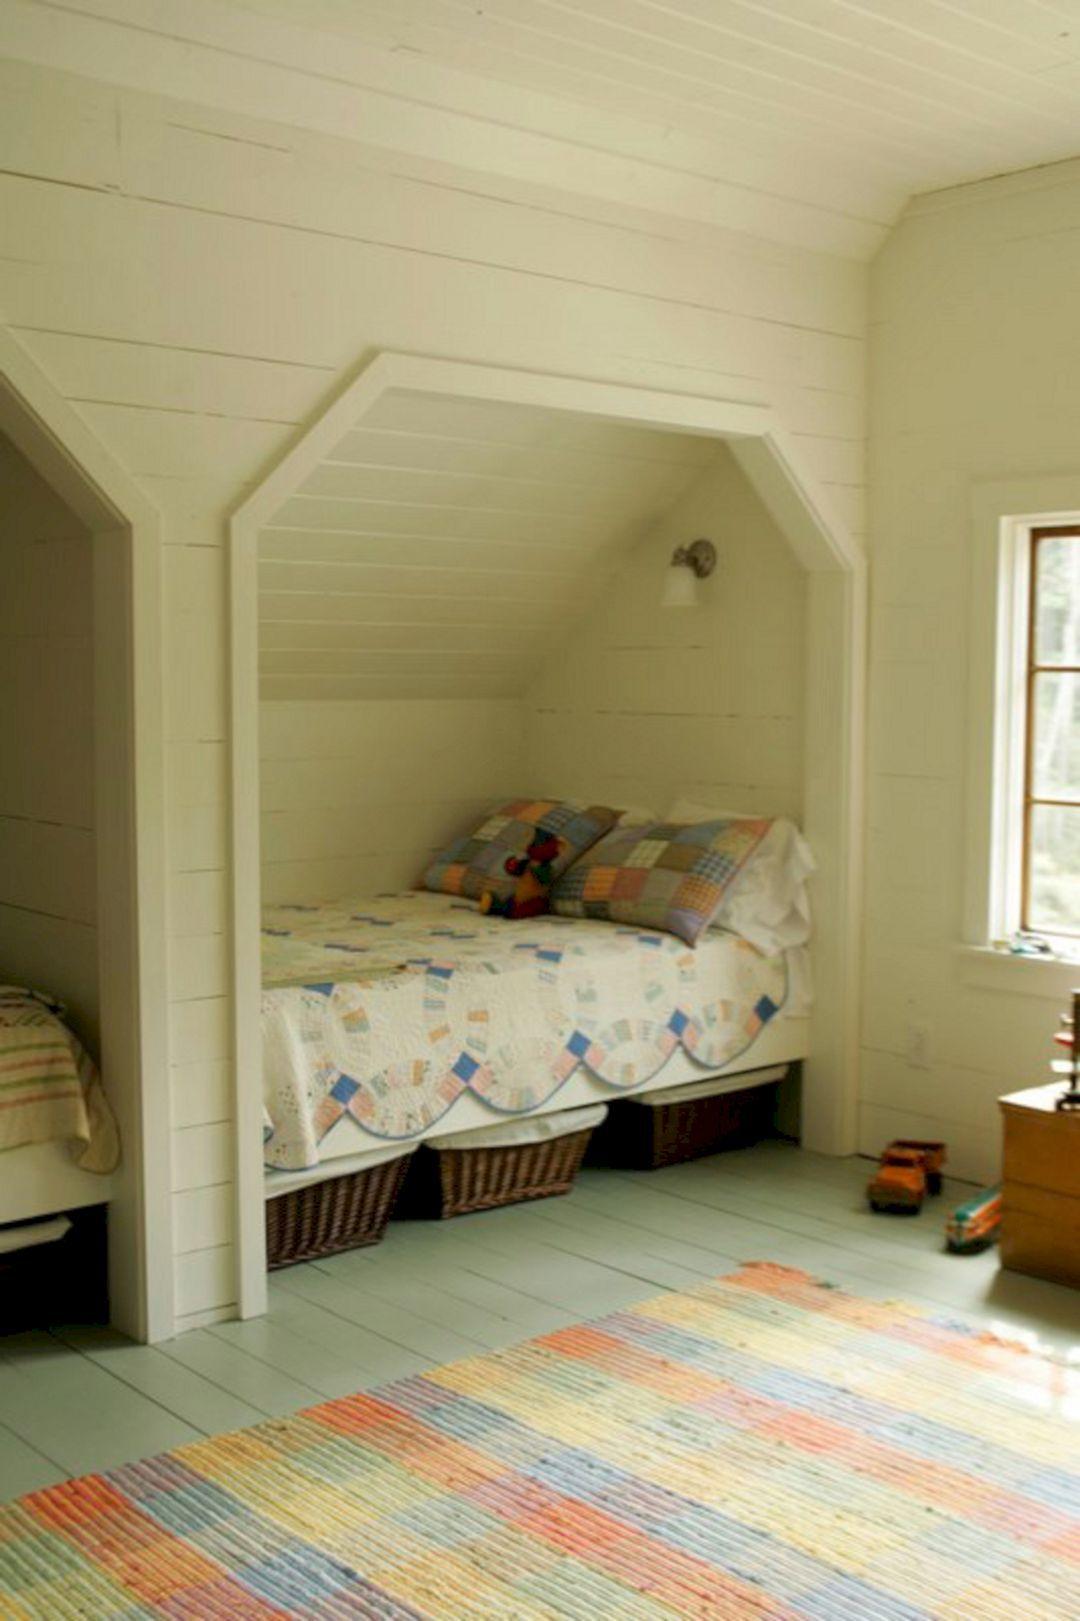 63 Comfortable Attic Playroom Design Ideas Freshouz Com Bed Nook Bunk Beds Built In Attic Rooms